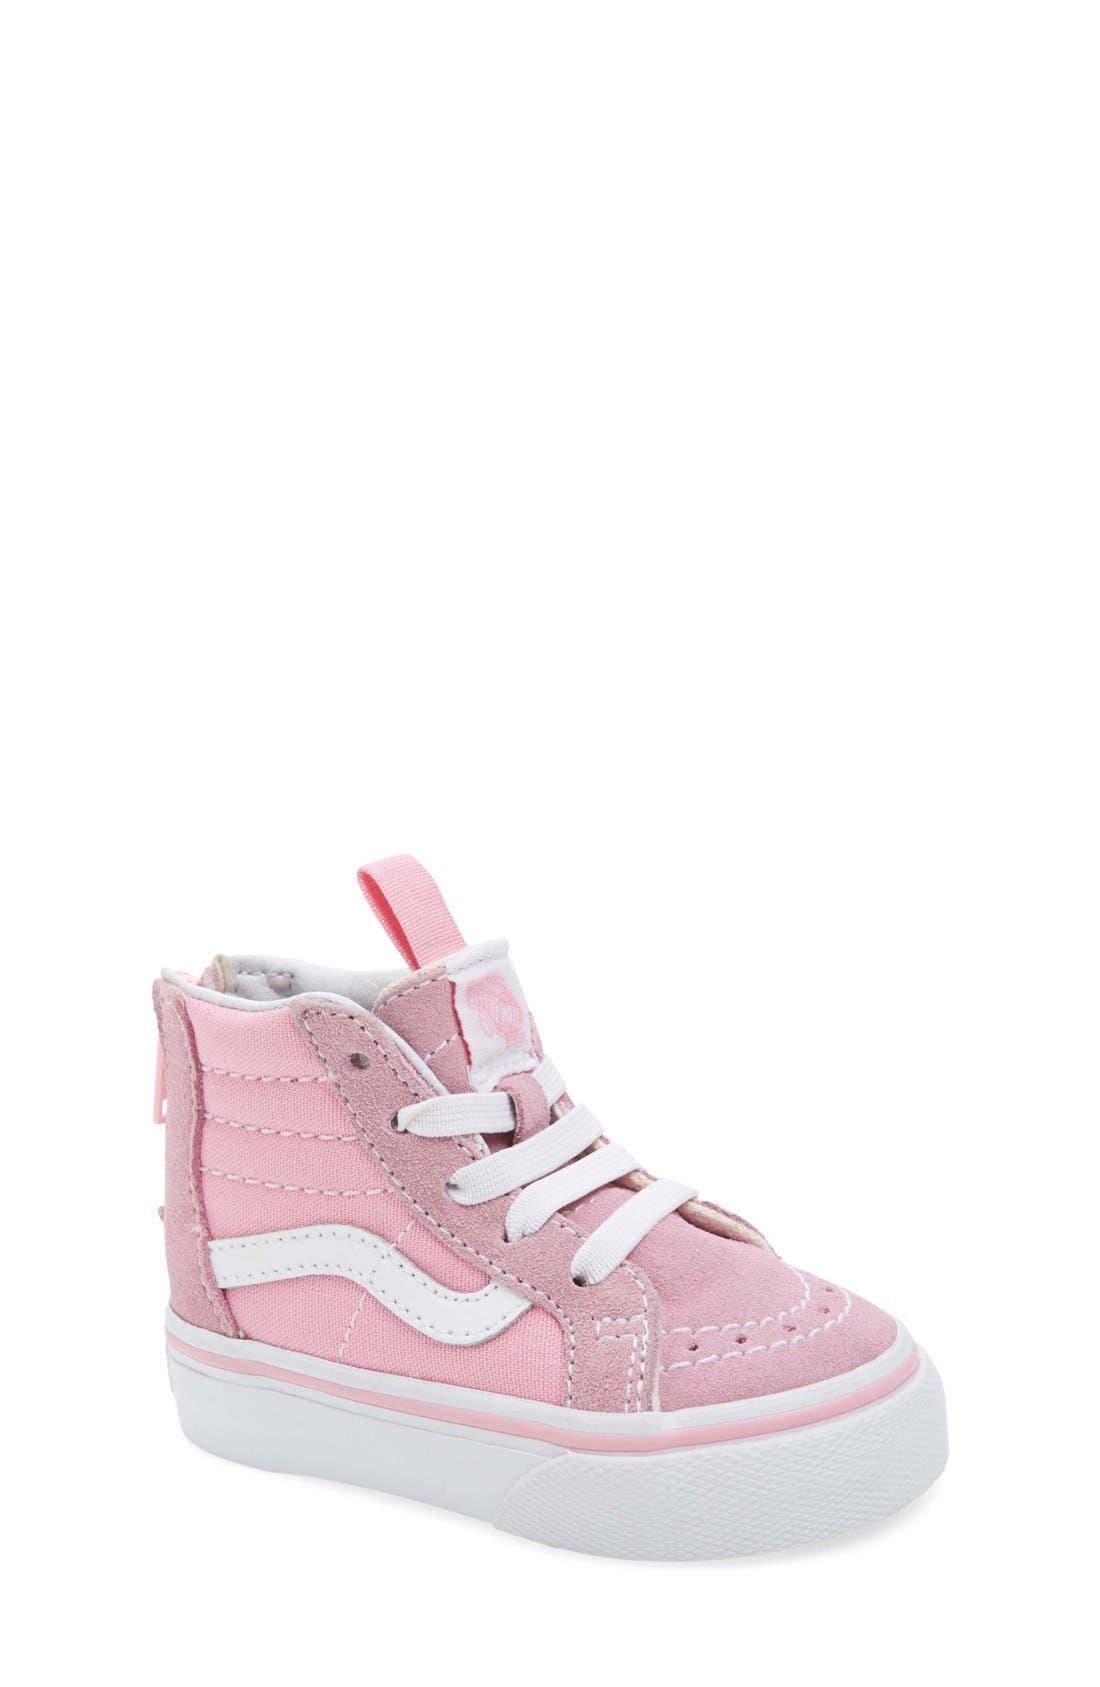 Alternate Image 1 Selected - Vans 'Sk8-Hi Zip' Sneaker (Walker & Toddler)